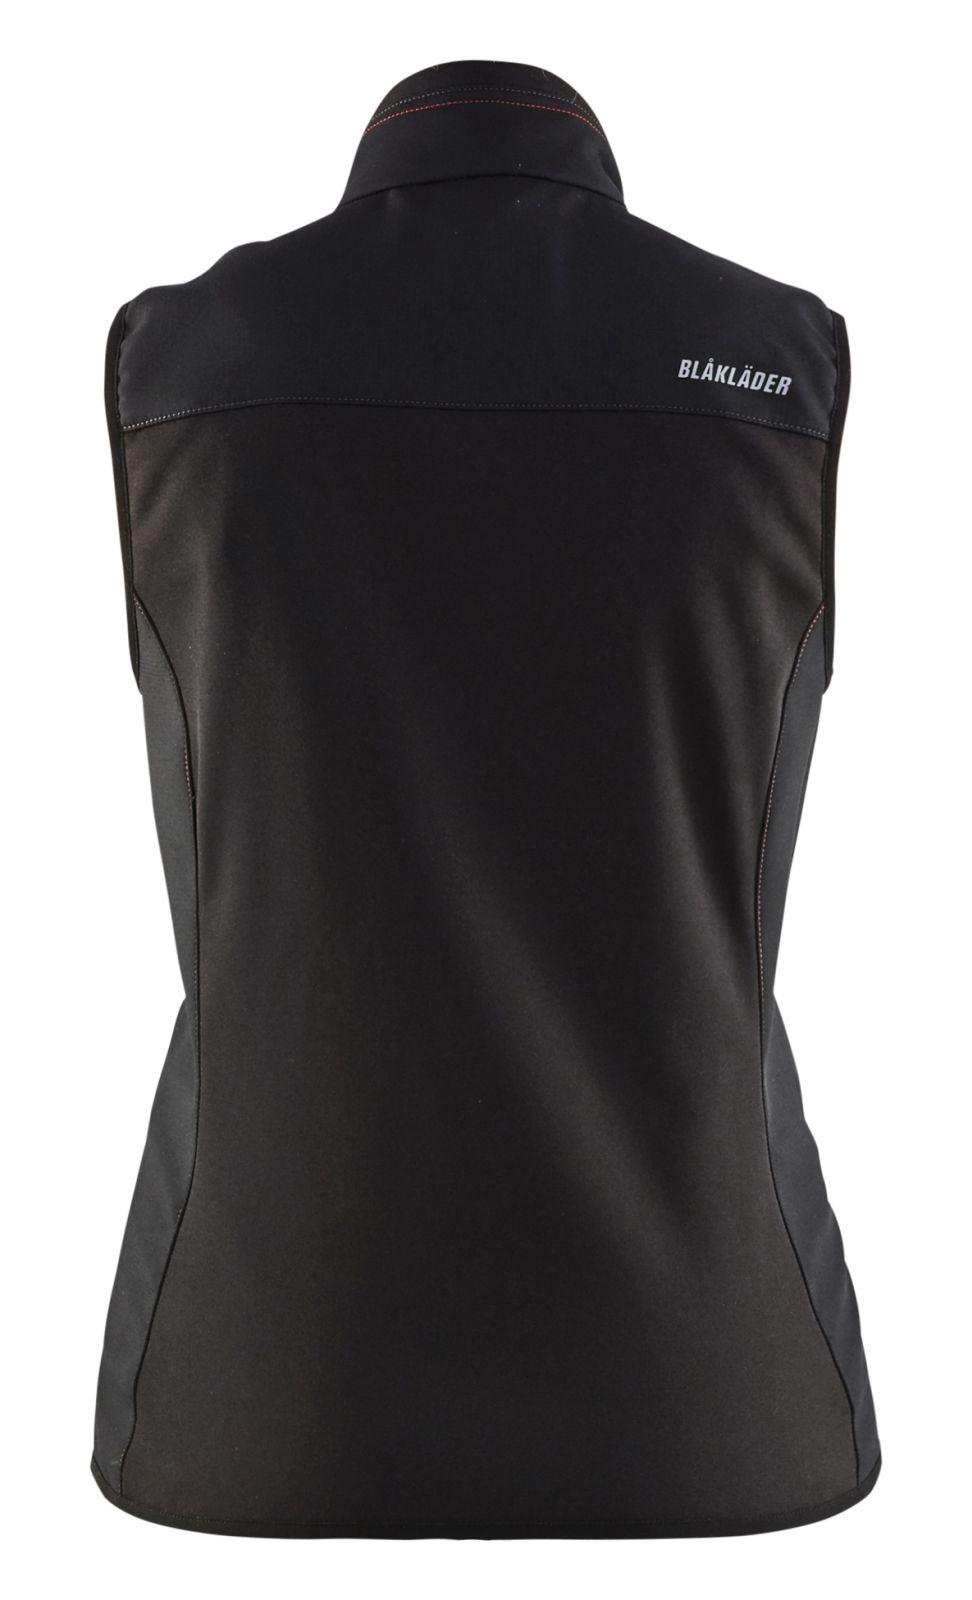 Blaklader Dames bodywarmers 38512516 zwart-rood(9956)